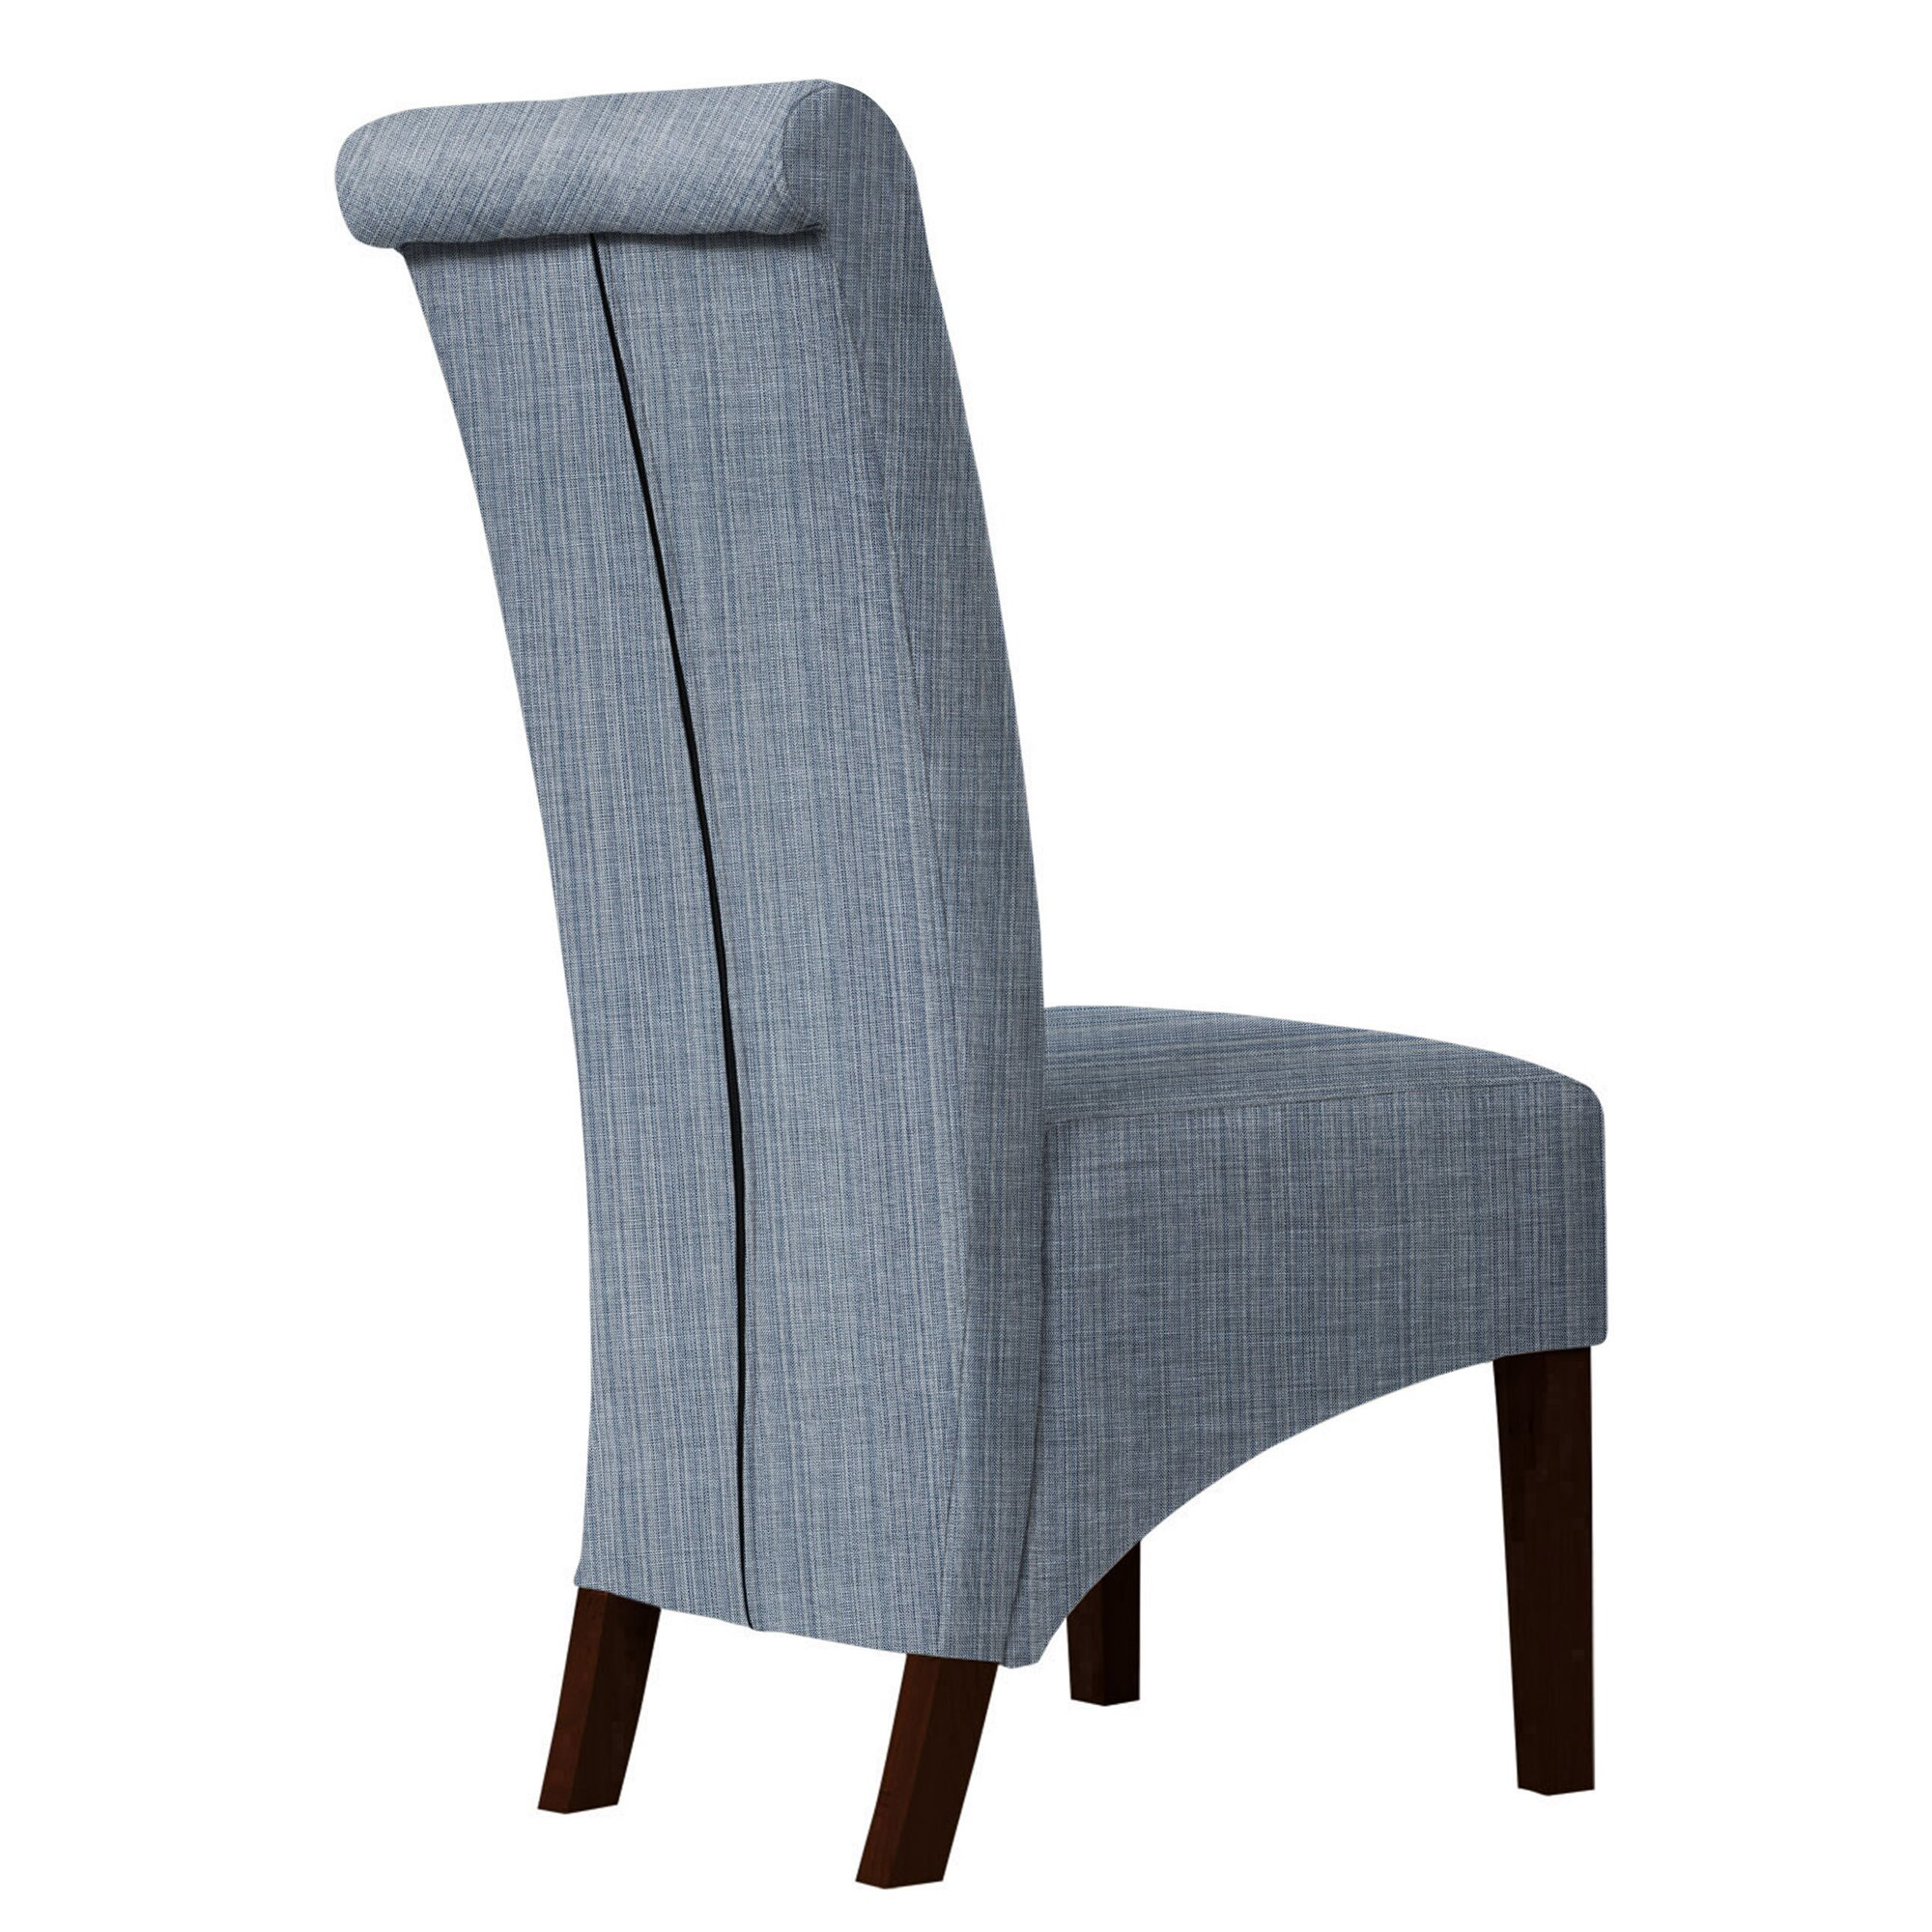 Red barrel studio keyesport upholstered dining chair - Red upholstered dining chairs ...